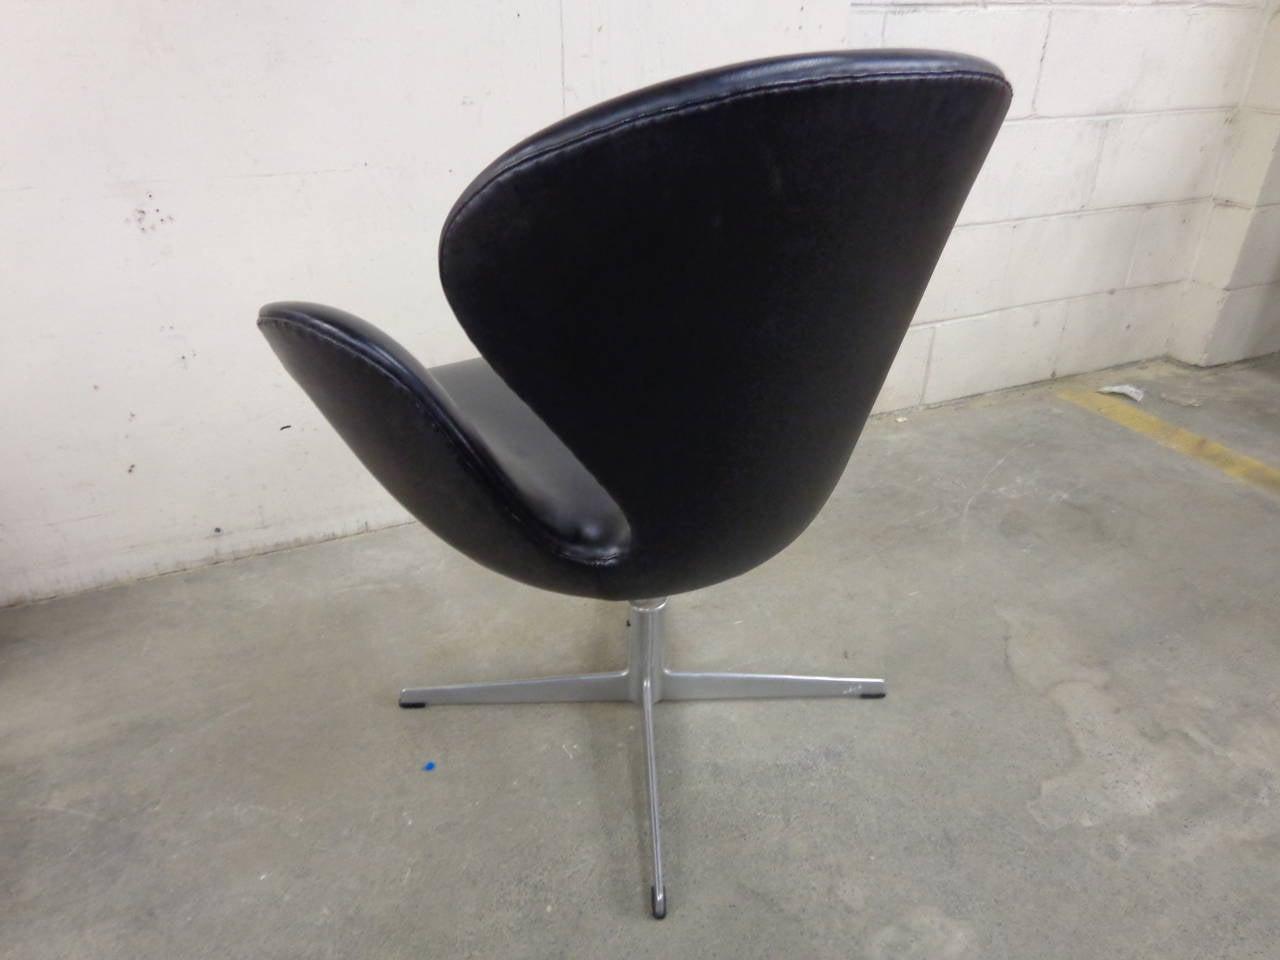 Arne jacobsen swan chair in original black vinyl for sale for Swan chairs for sale